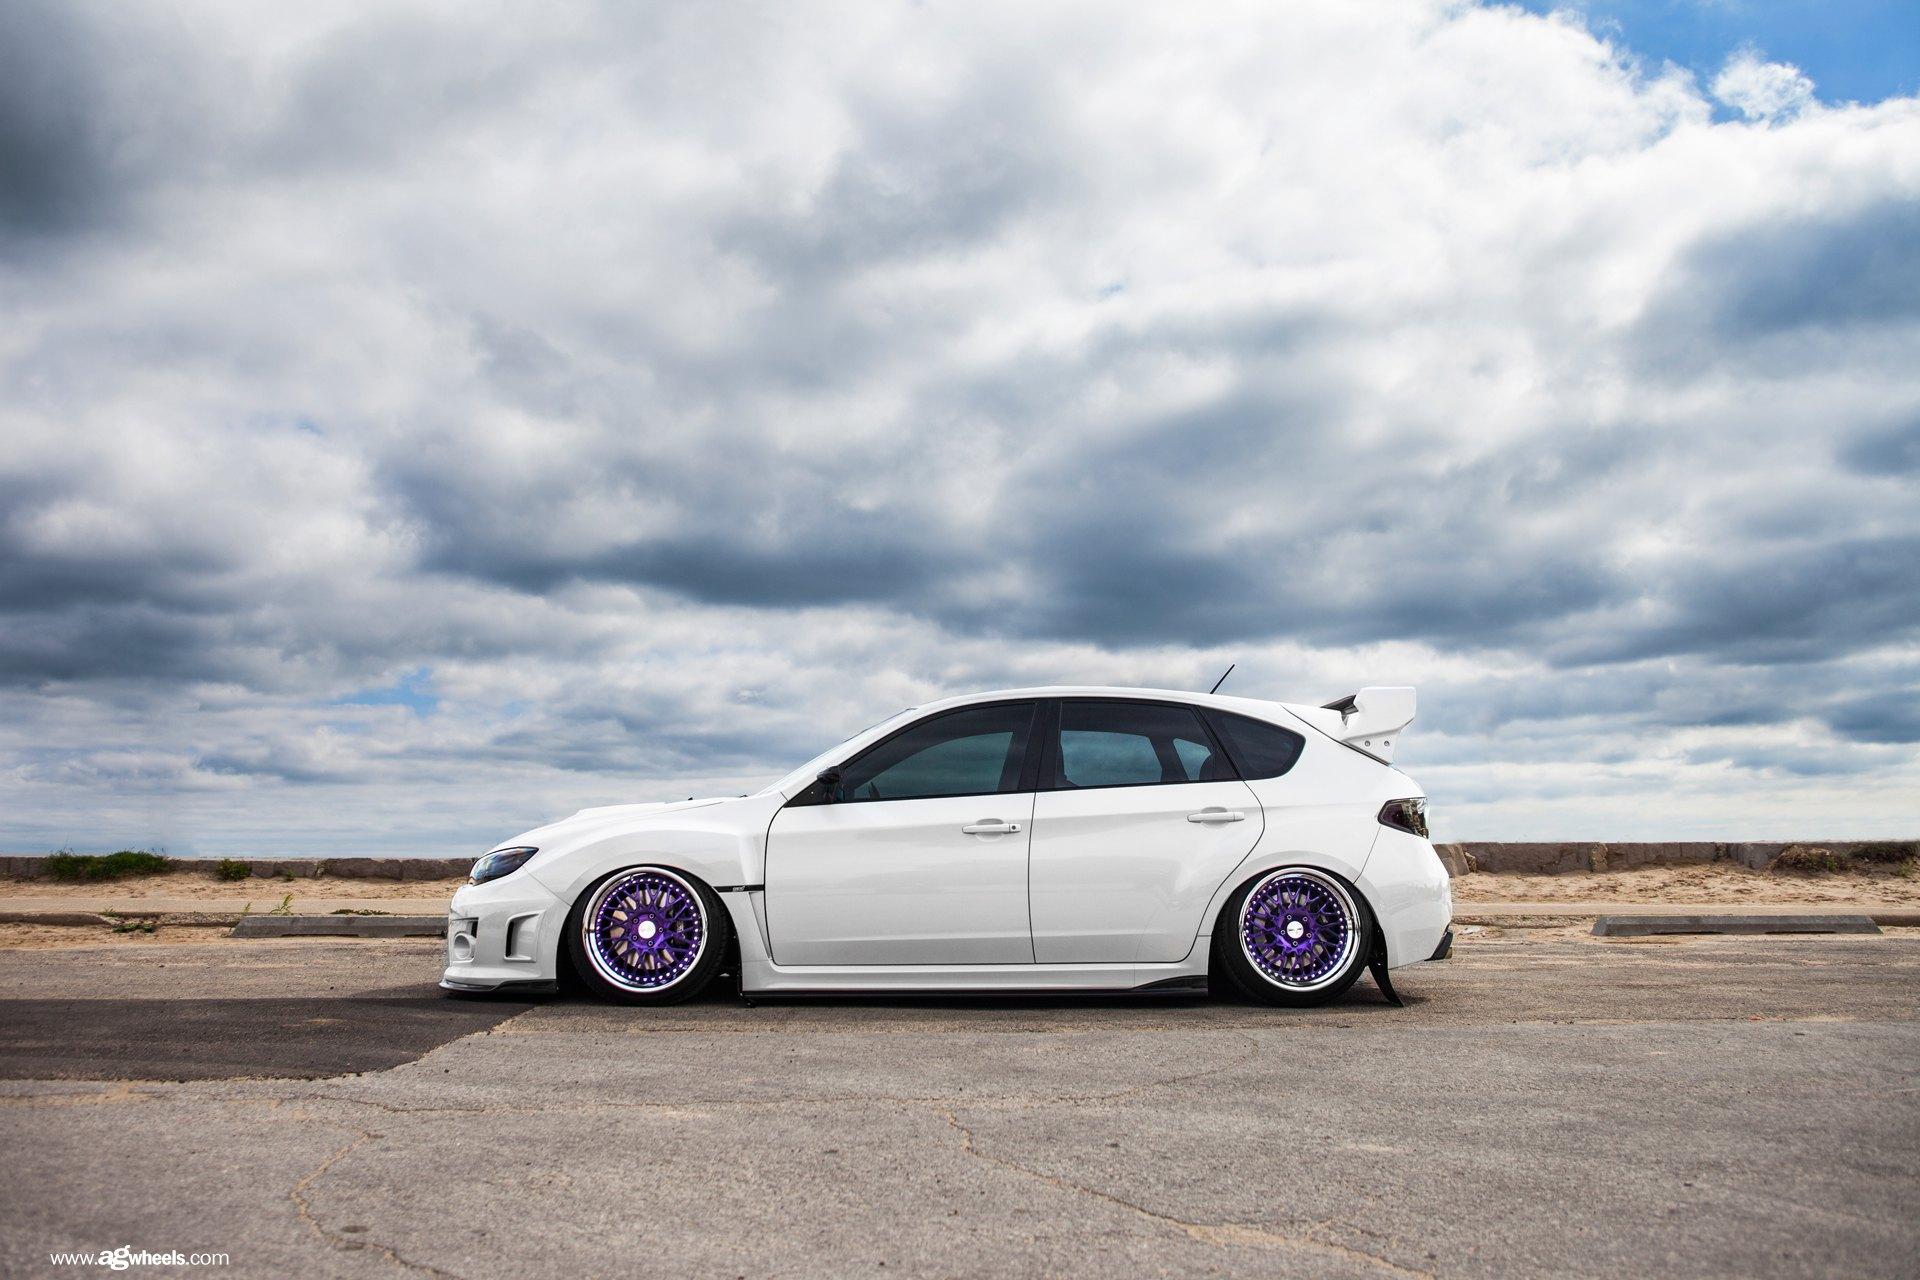 Amazing Transformation of White Stanced Subaru WRX with Custom Parts